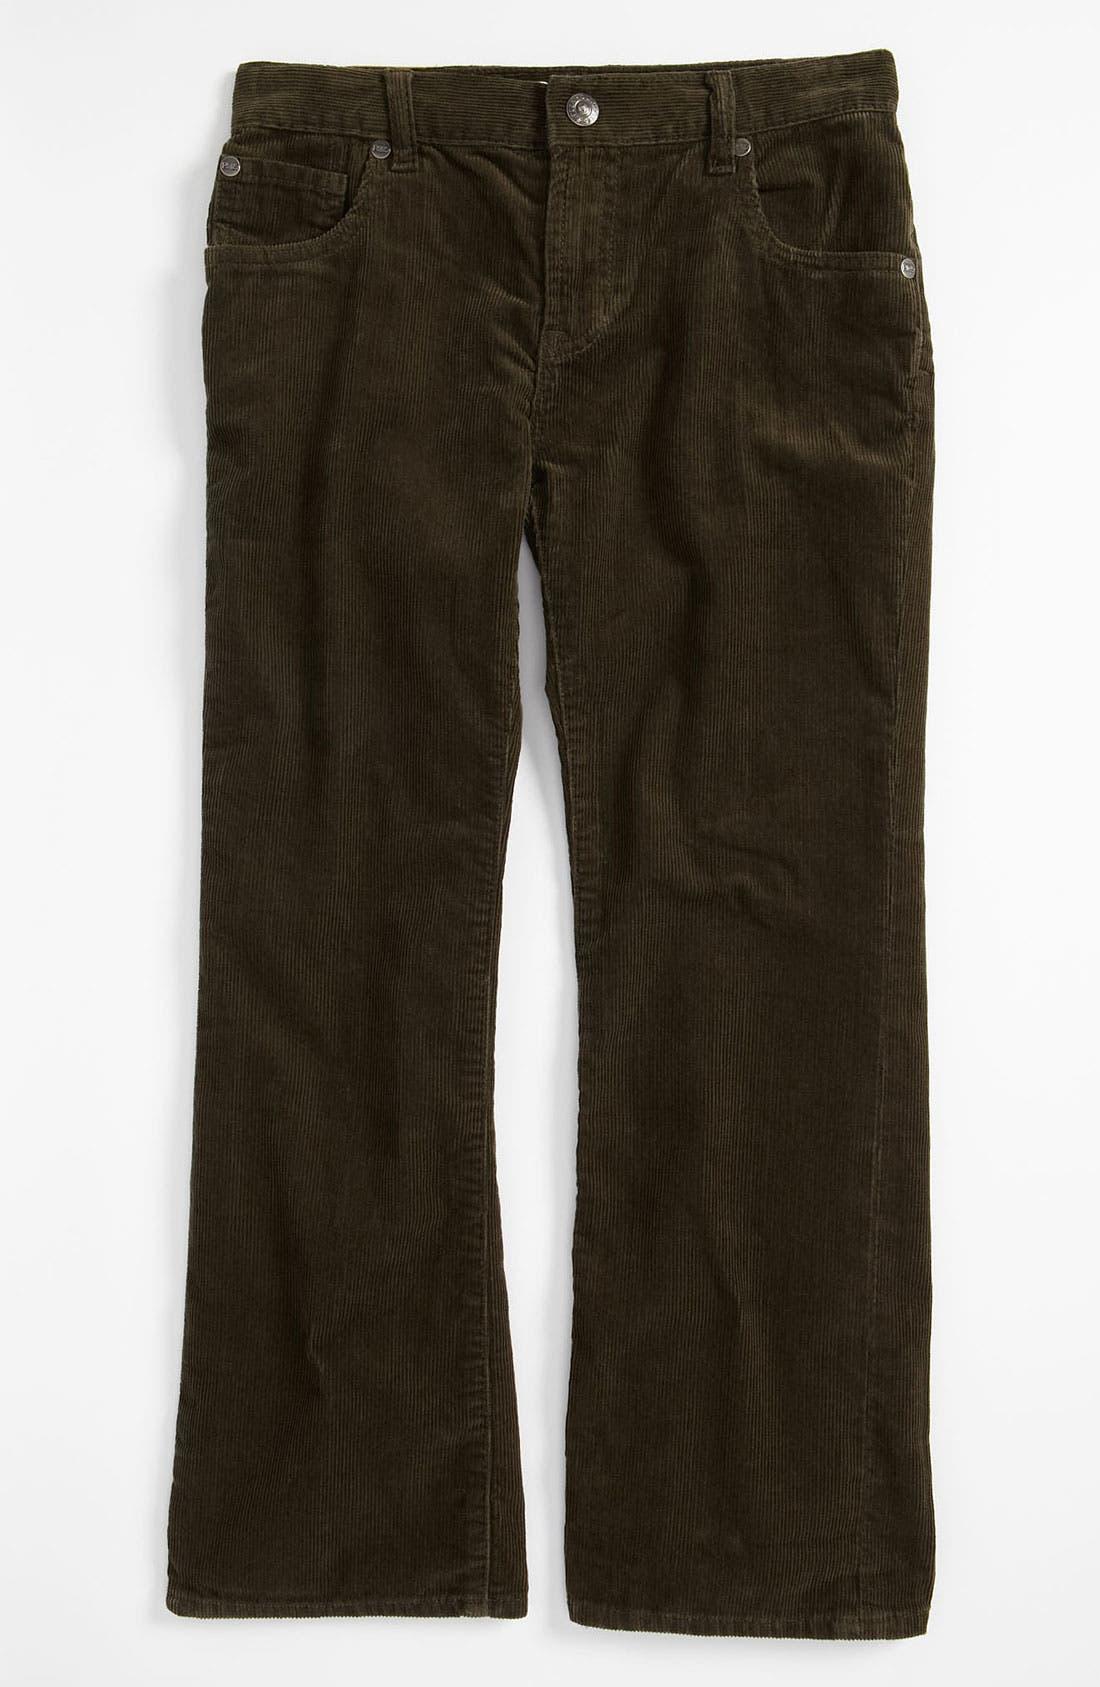 Alternate Image 1 Selected - Peek 'Sullivan' Corduroy Jeans (Toddler, Little Boys & Big Boys)